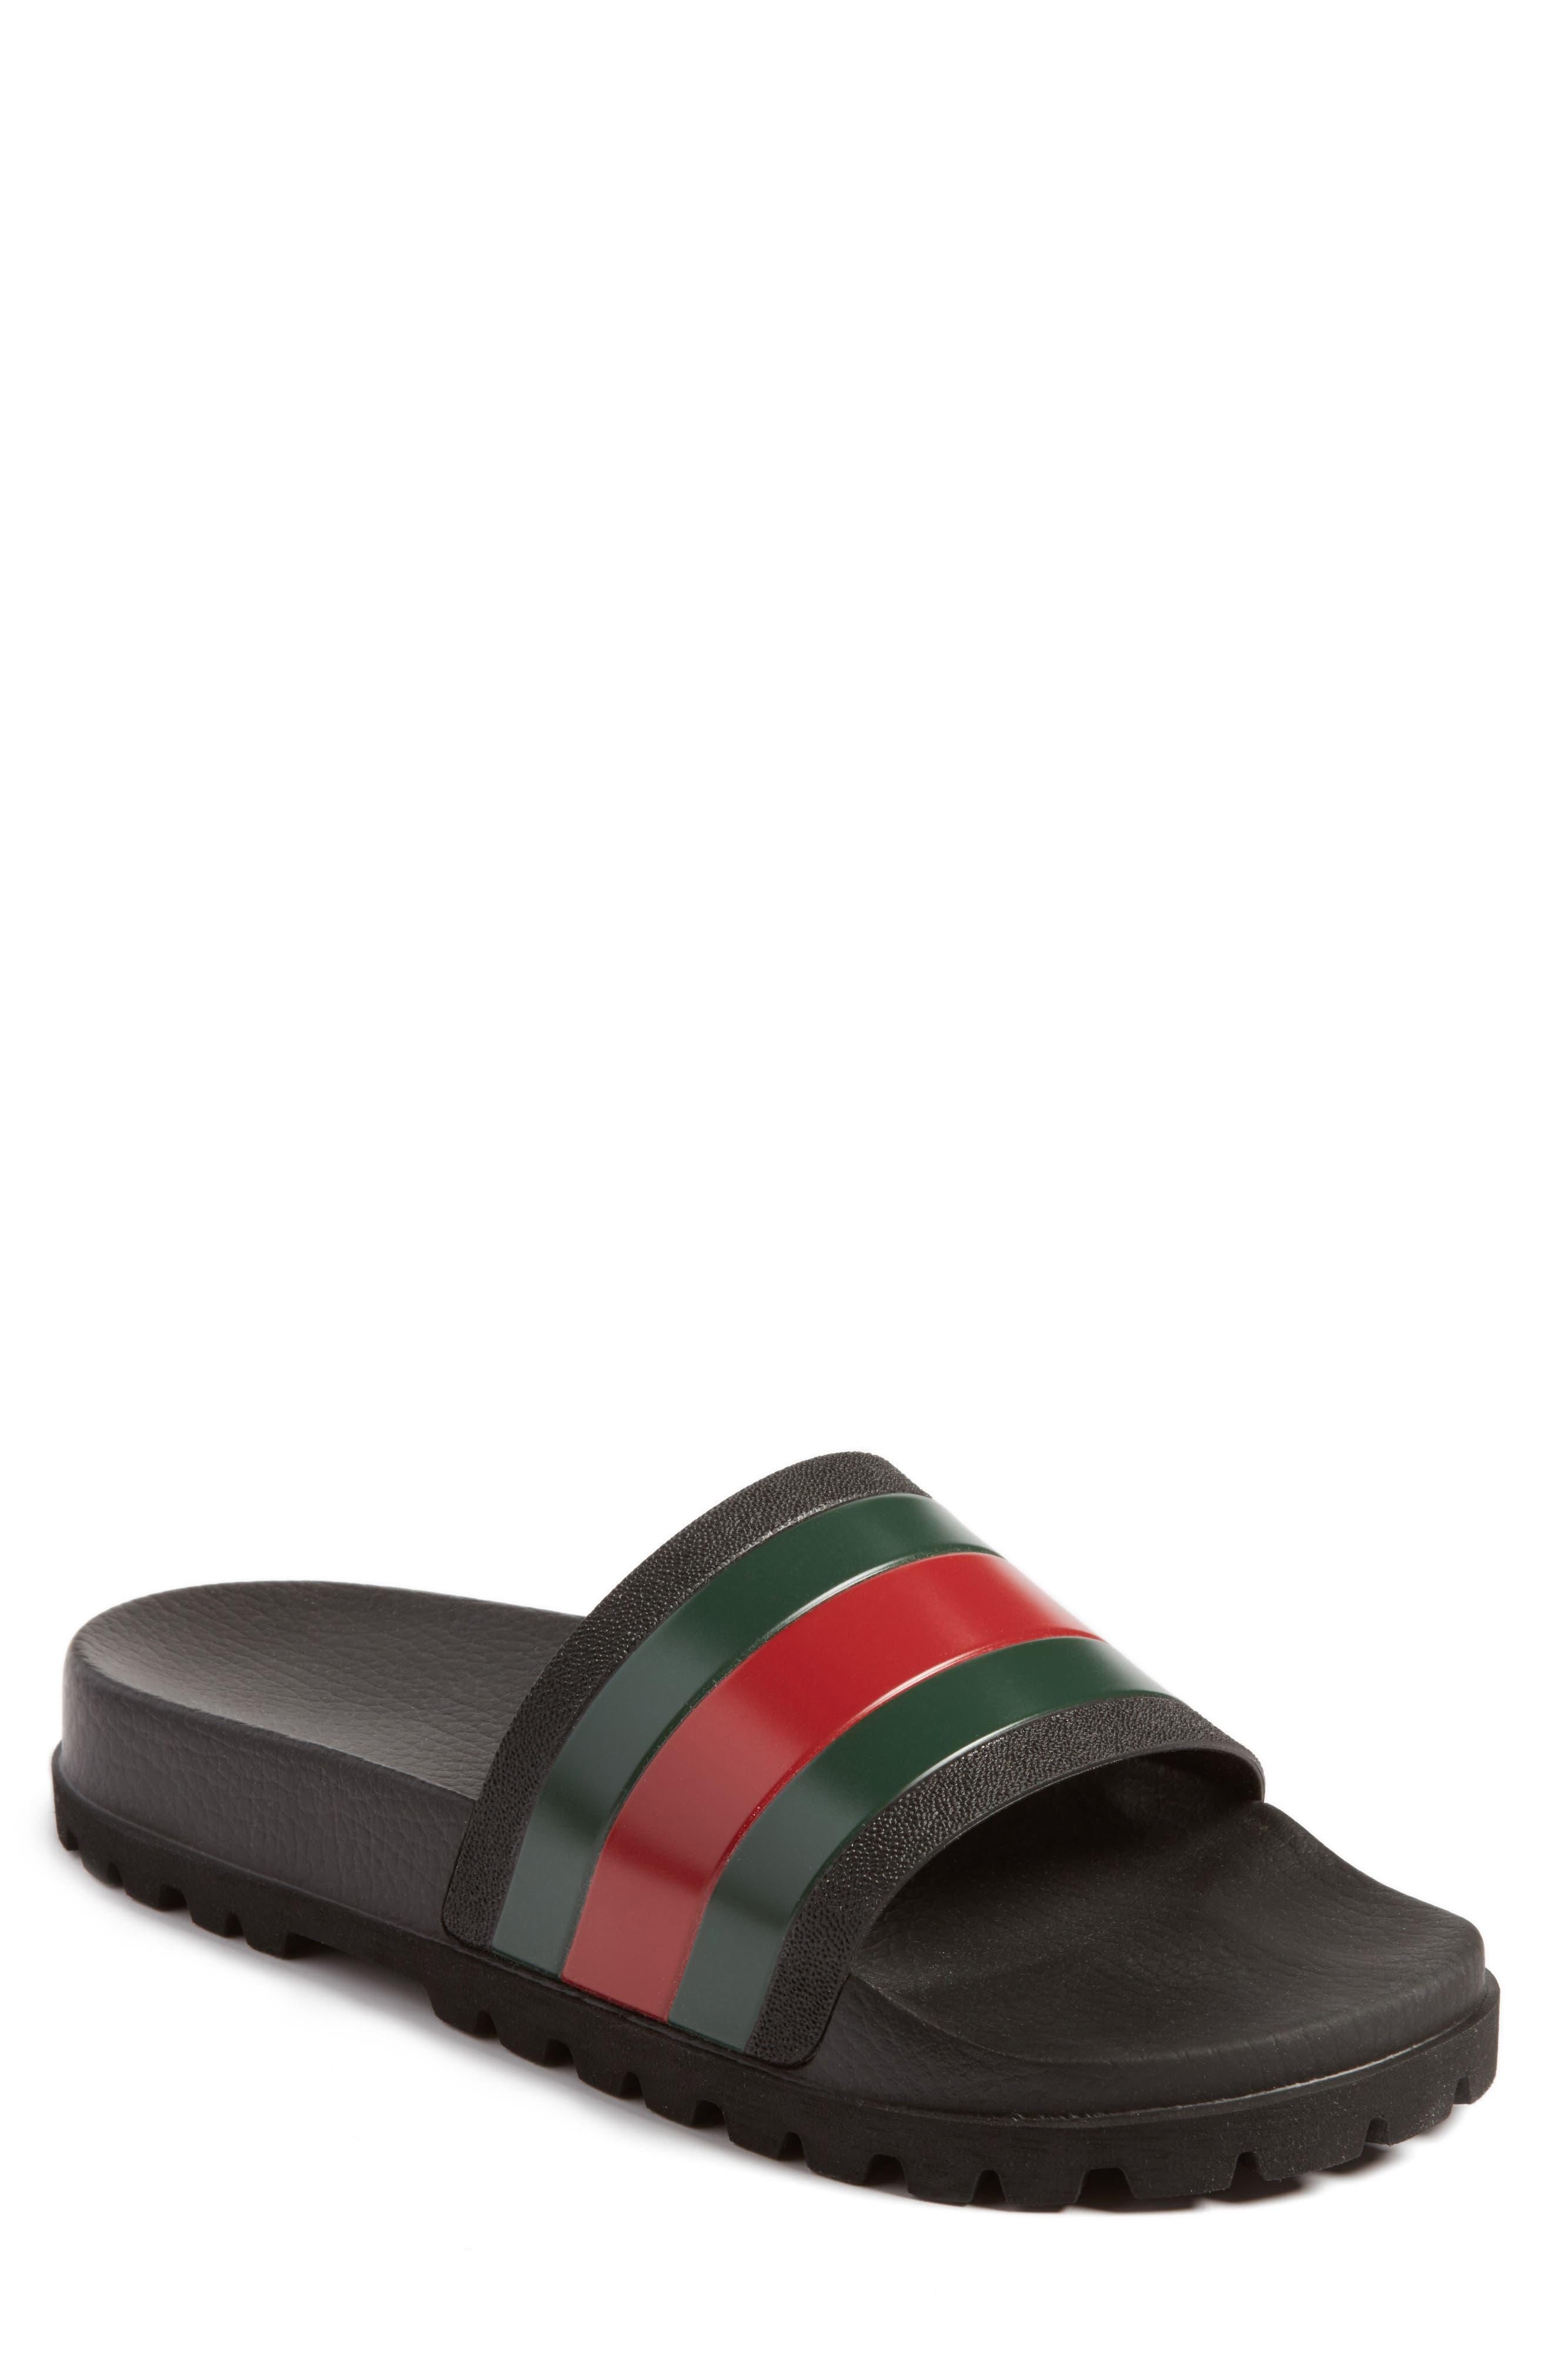 GUCCI, 'Pursuit Treck' Slide Sandal, Main thumbnail 1, color, NERO/NERO